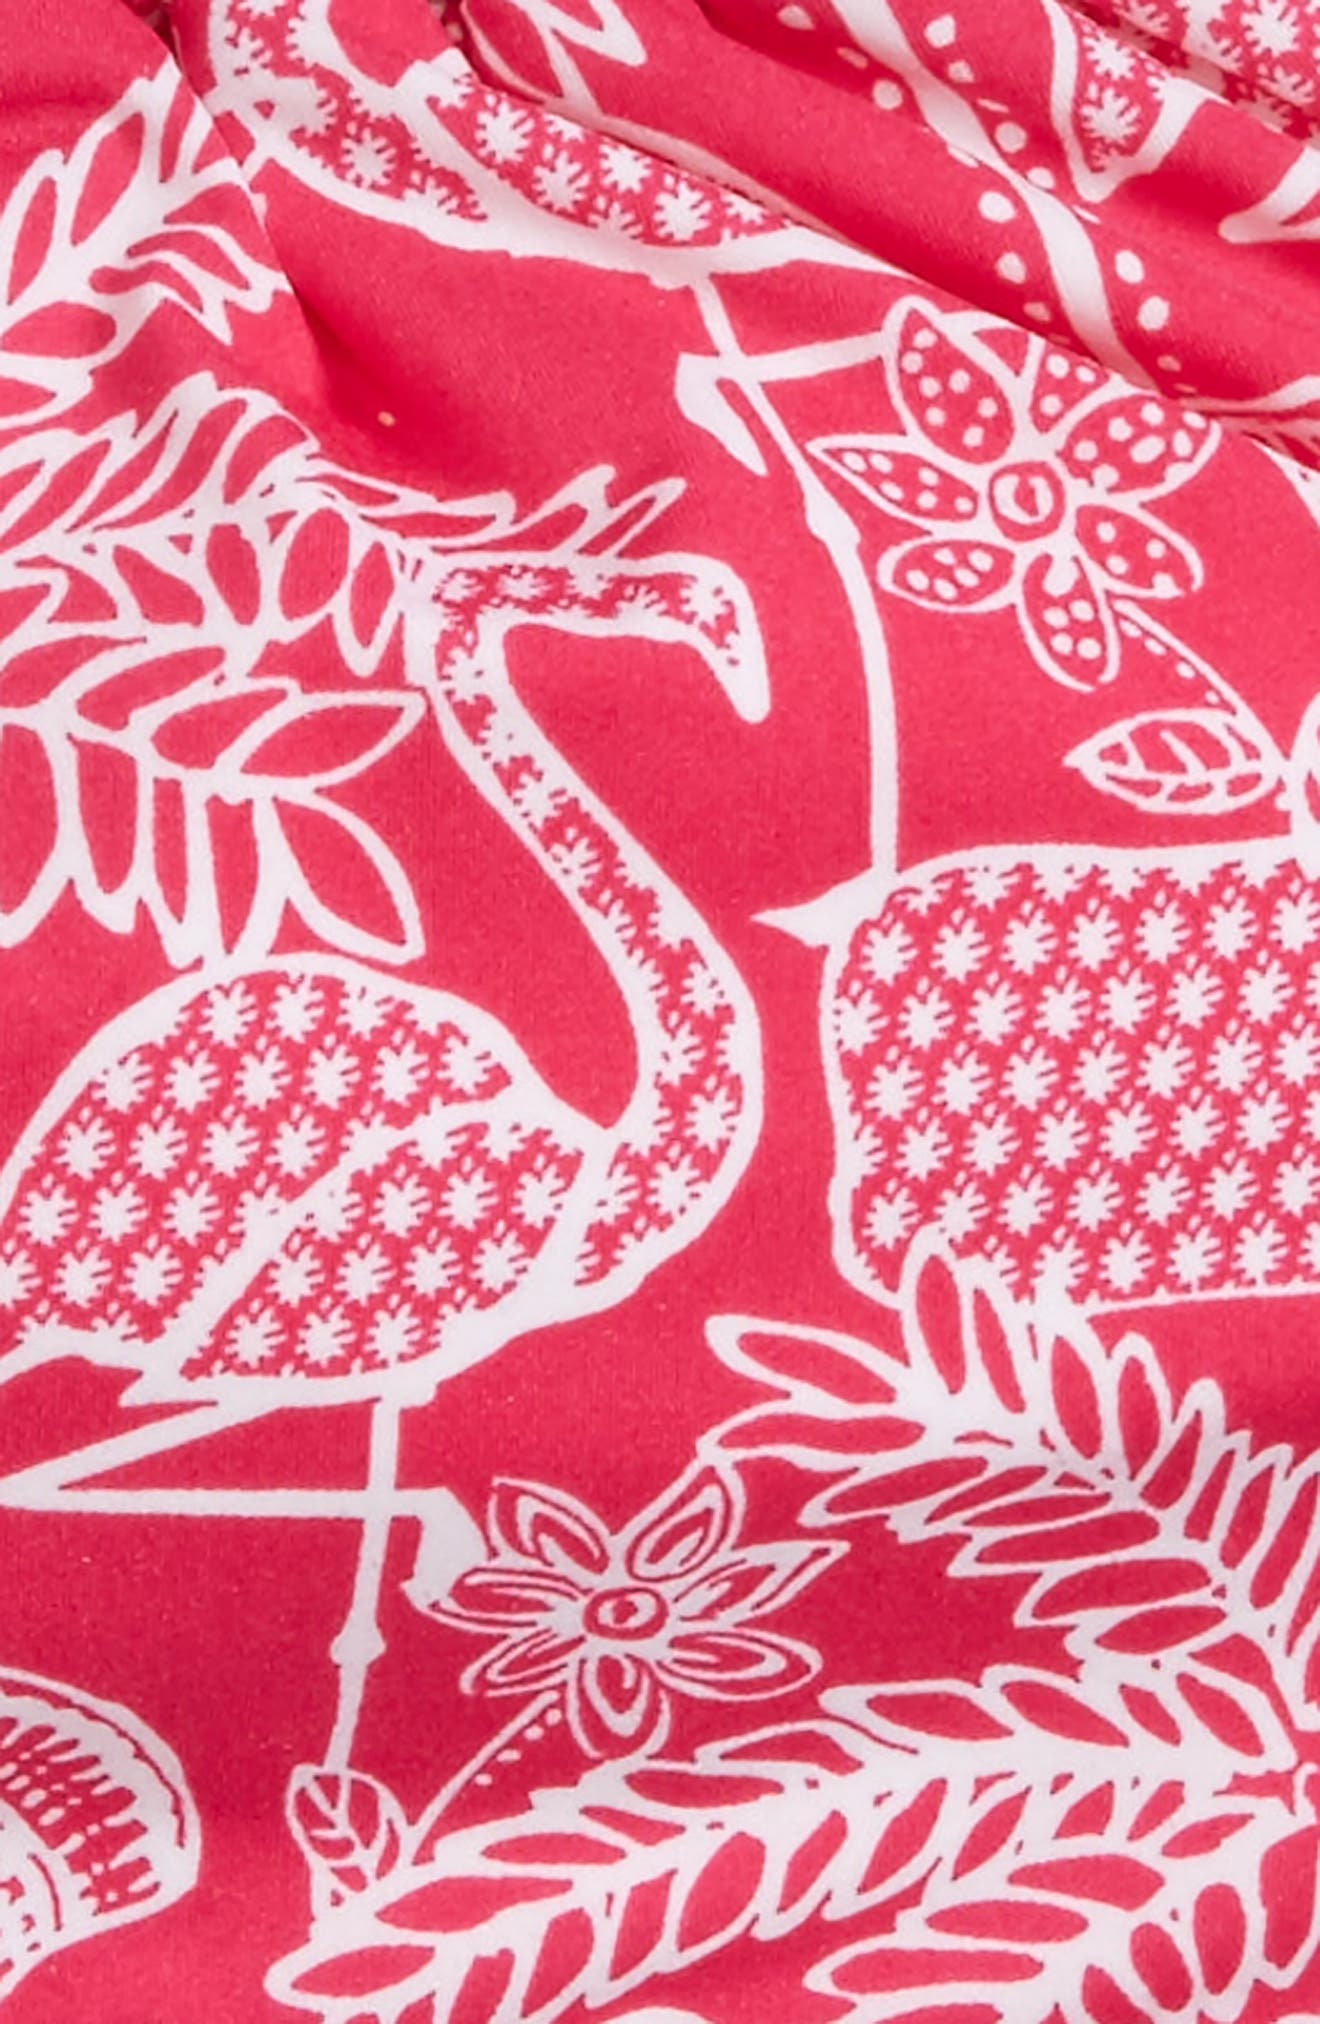 Flamingo Print Reversible Two-Piece Halter Swimsuit,                             Alternate thumbnail 3, color,                             658